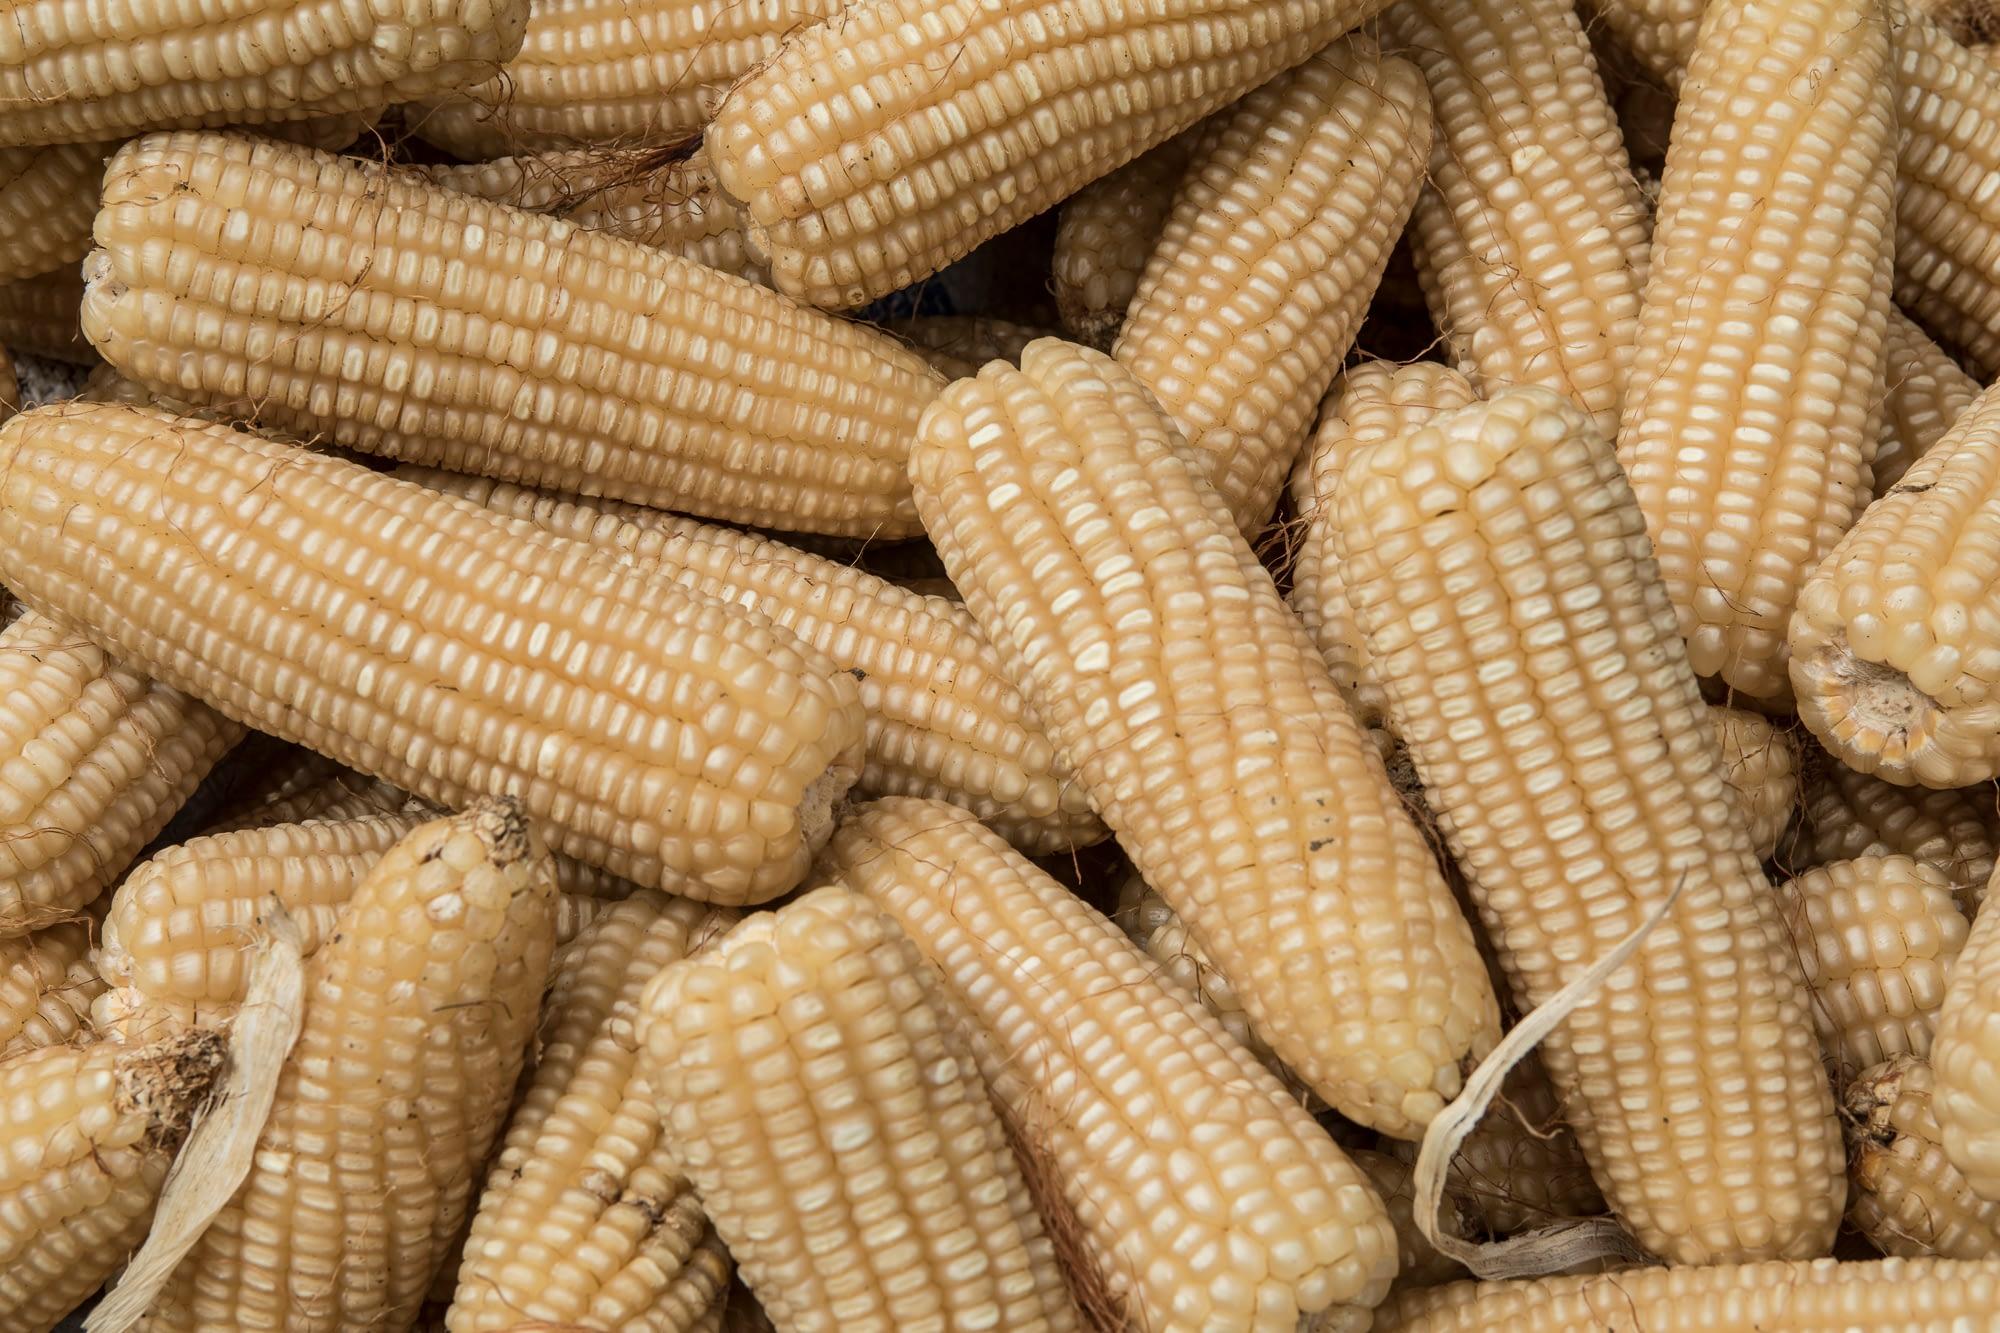 New zinc-biofortified maize variety BIO-MZn01. (Photo: CIMMYT)